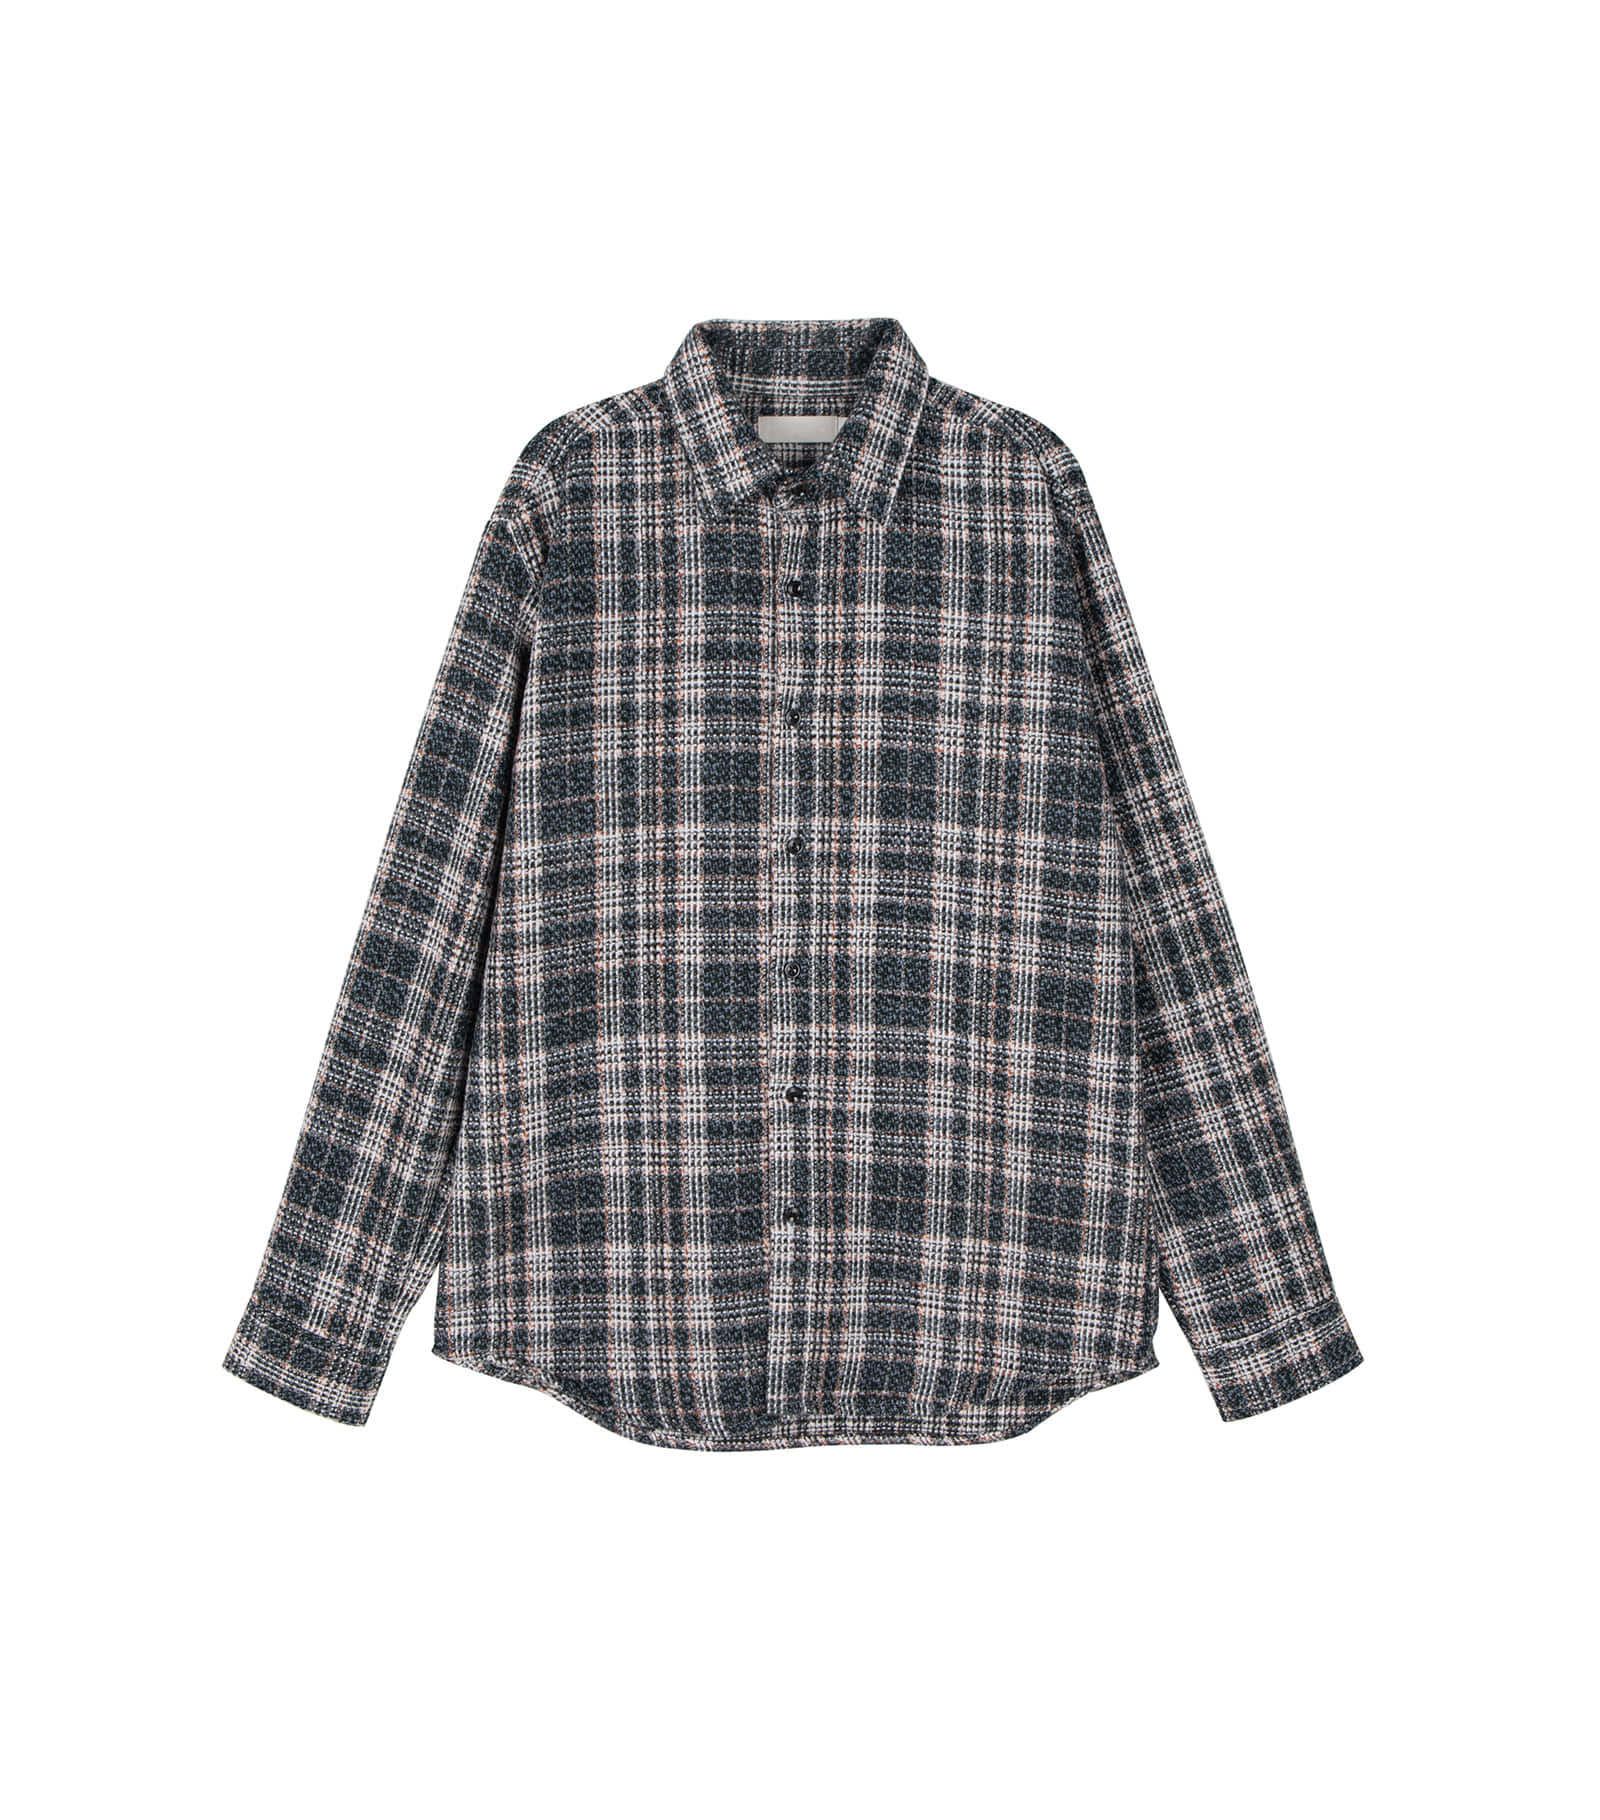 Molk unisex check shirt